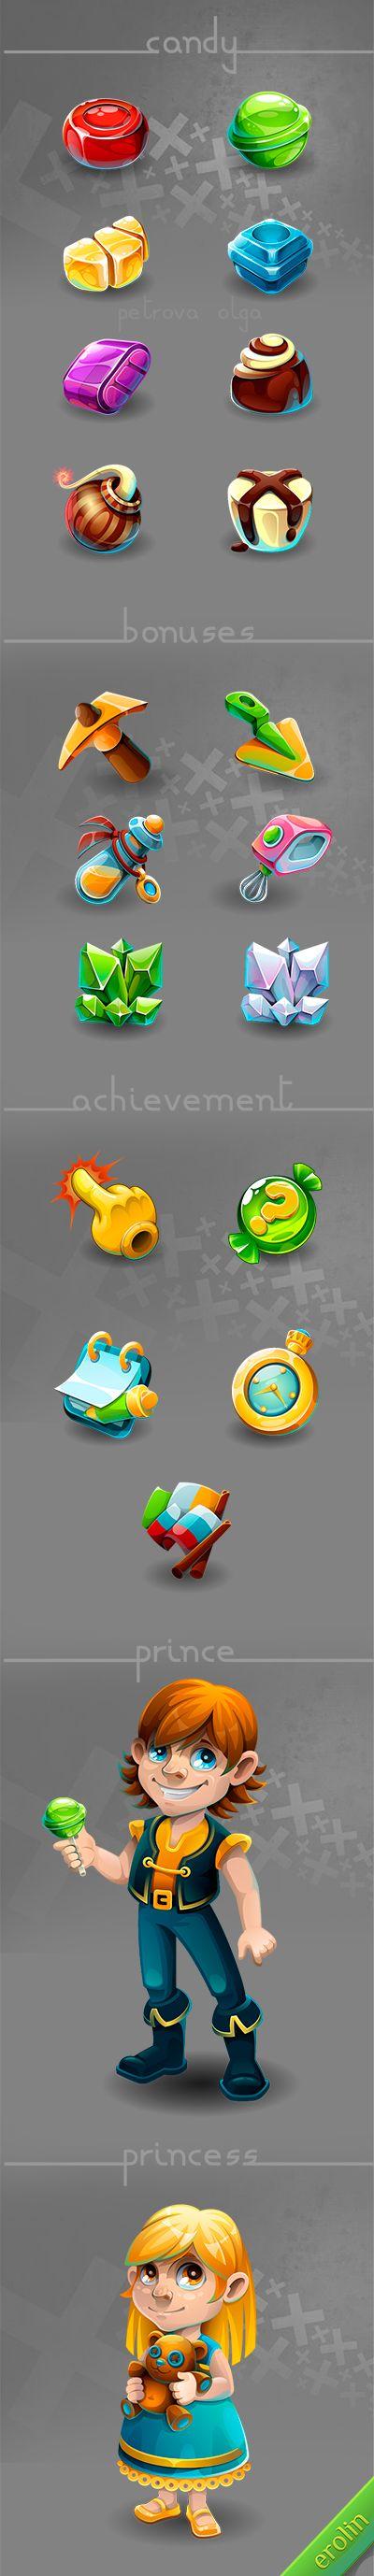 "Game ""Candy Kingdom 2"" by Olga Petrova, via Behance"